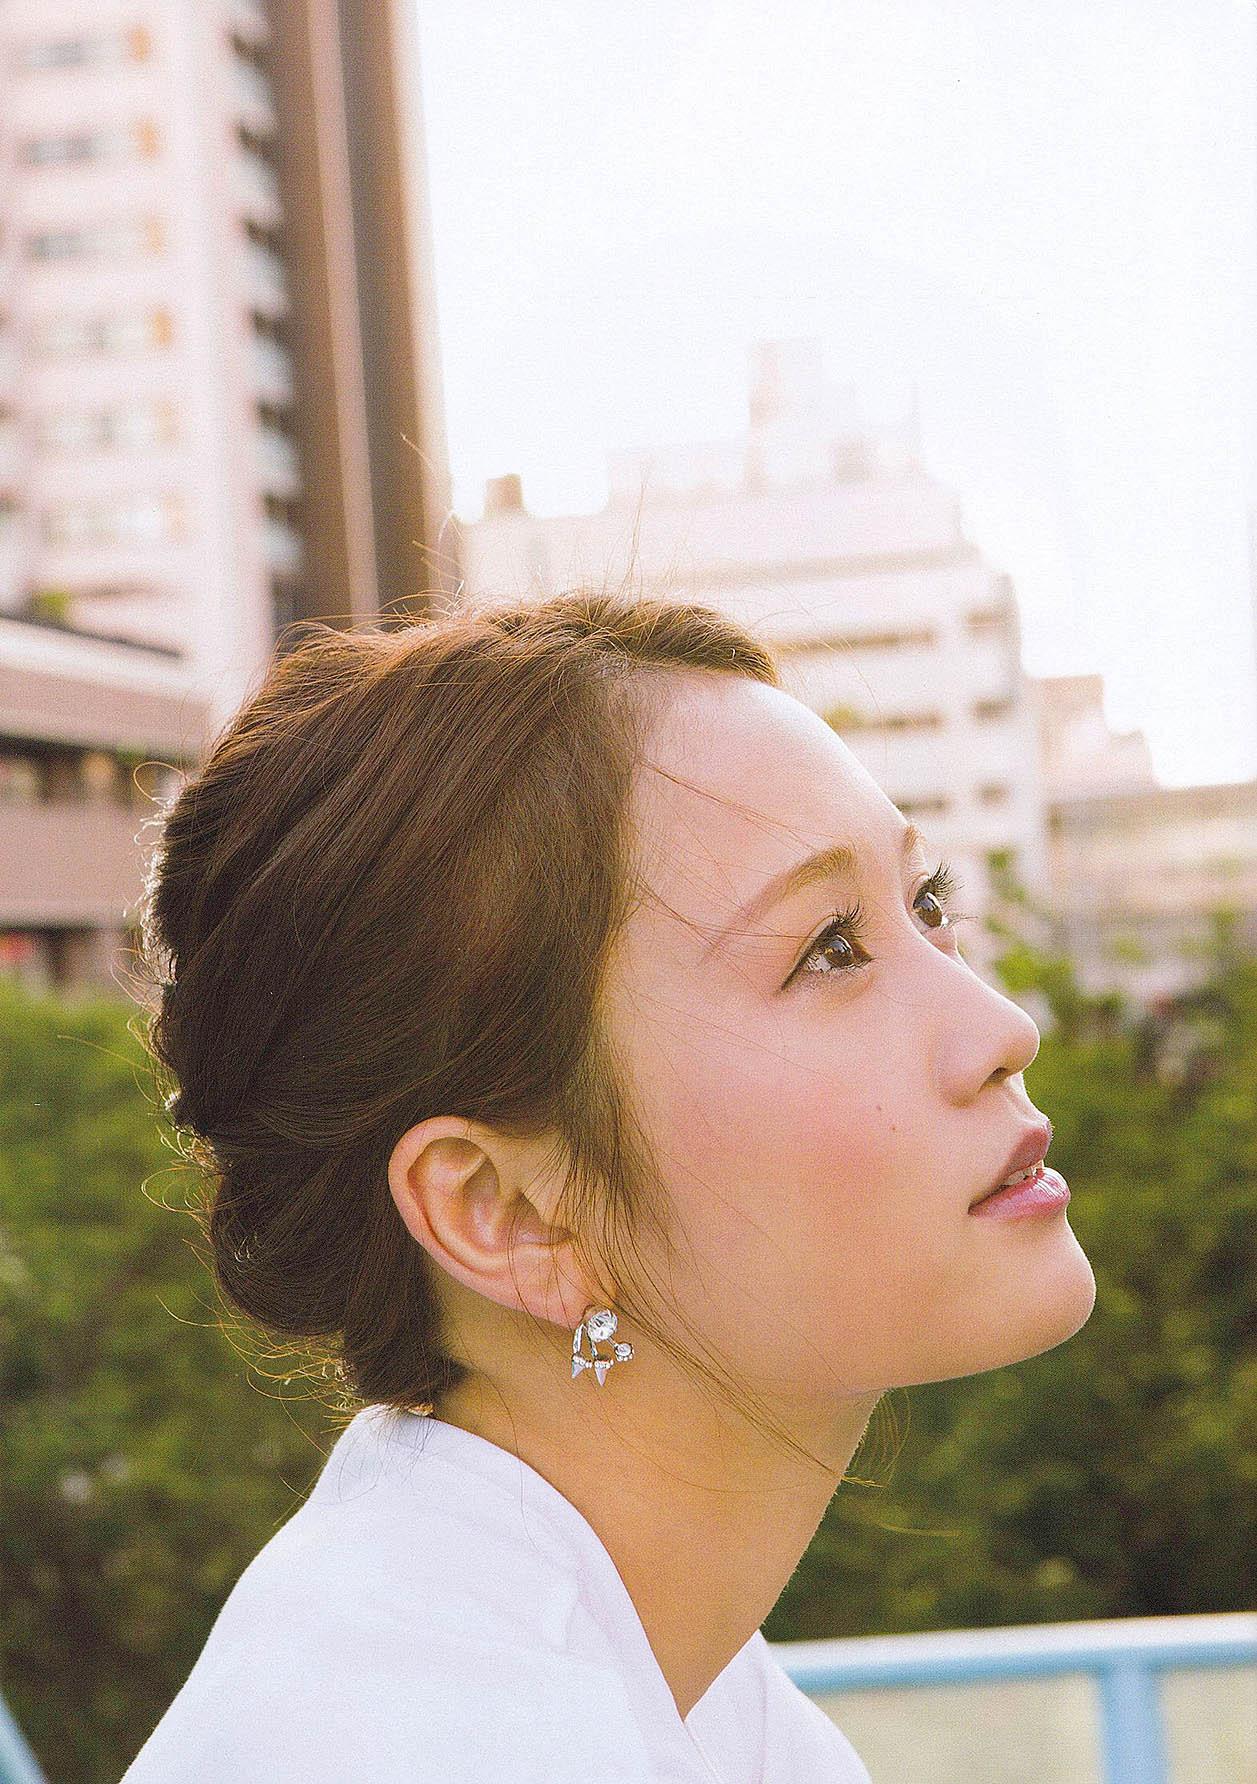 MAtsuko Flash Sp Gravure Best Midsummer 2015 04.jpg